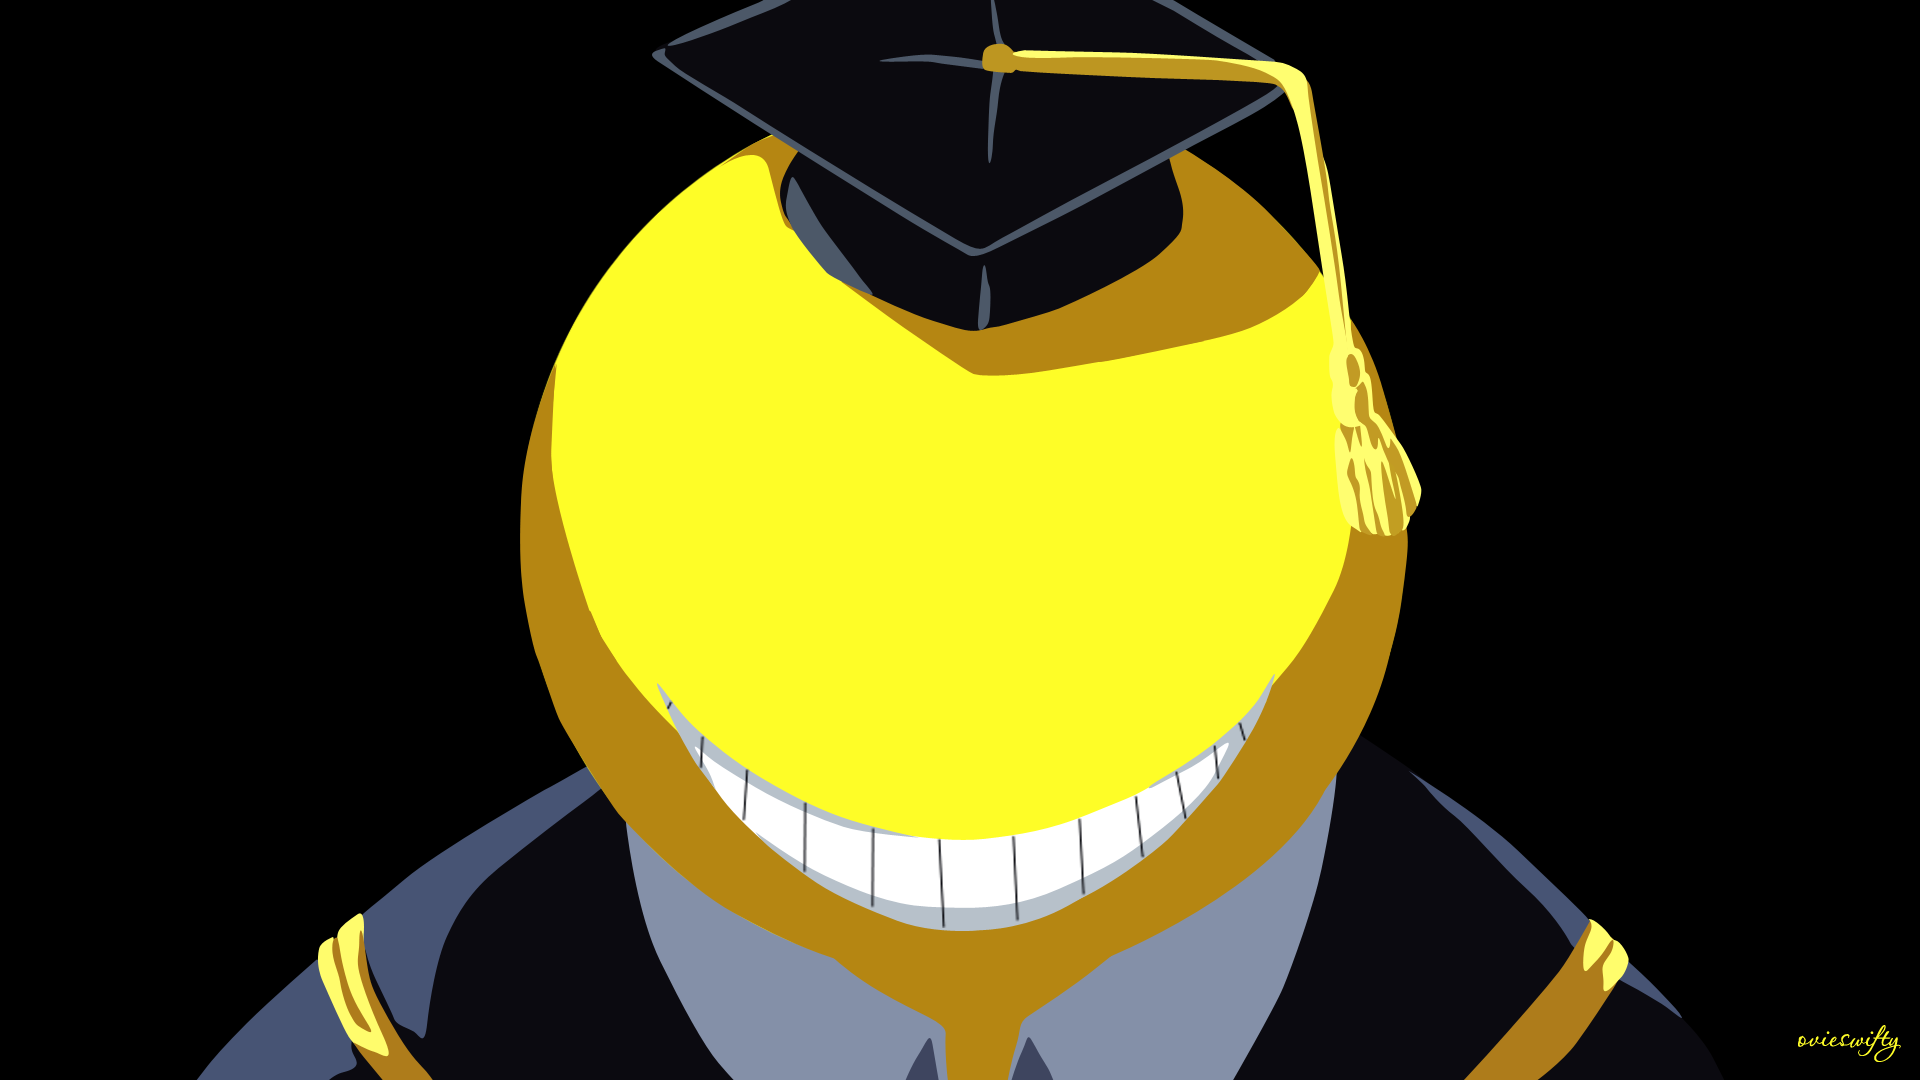 Koro Sensei Normal Assassination Classroom By Ovieswifty On Deviantart Assassination Classroom Koro Sensei Face Anime Book